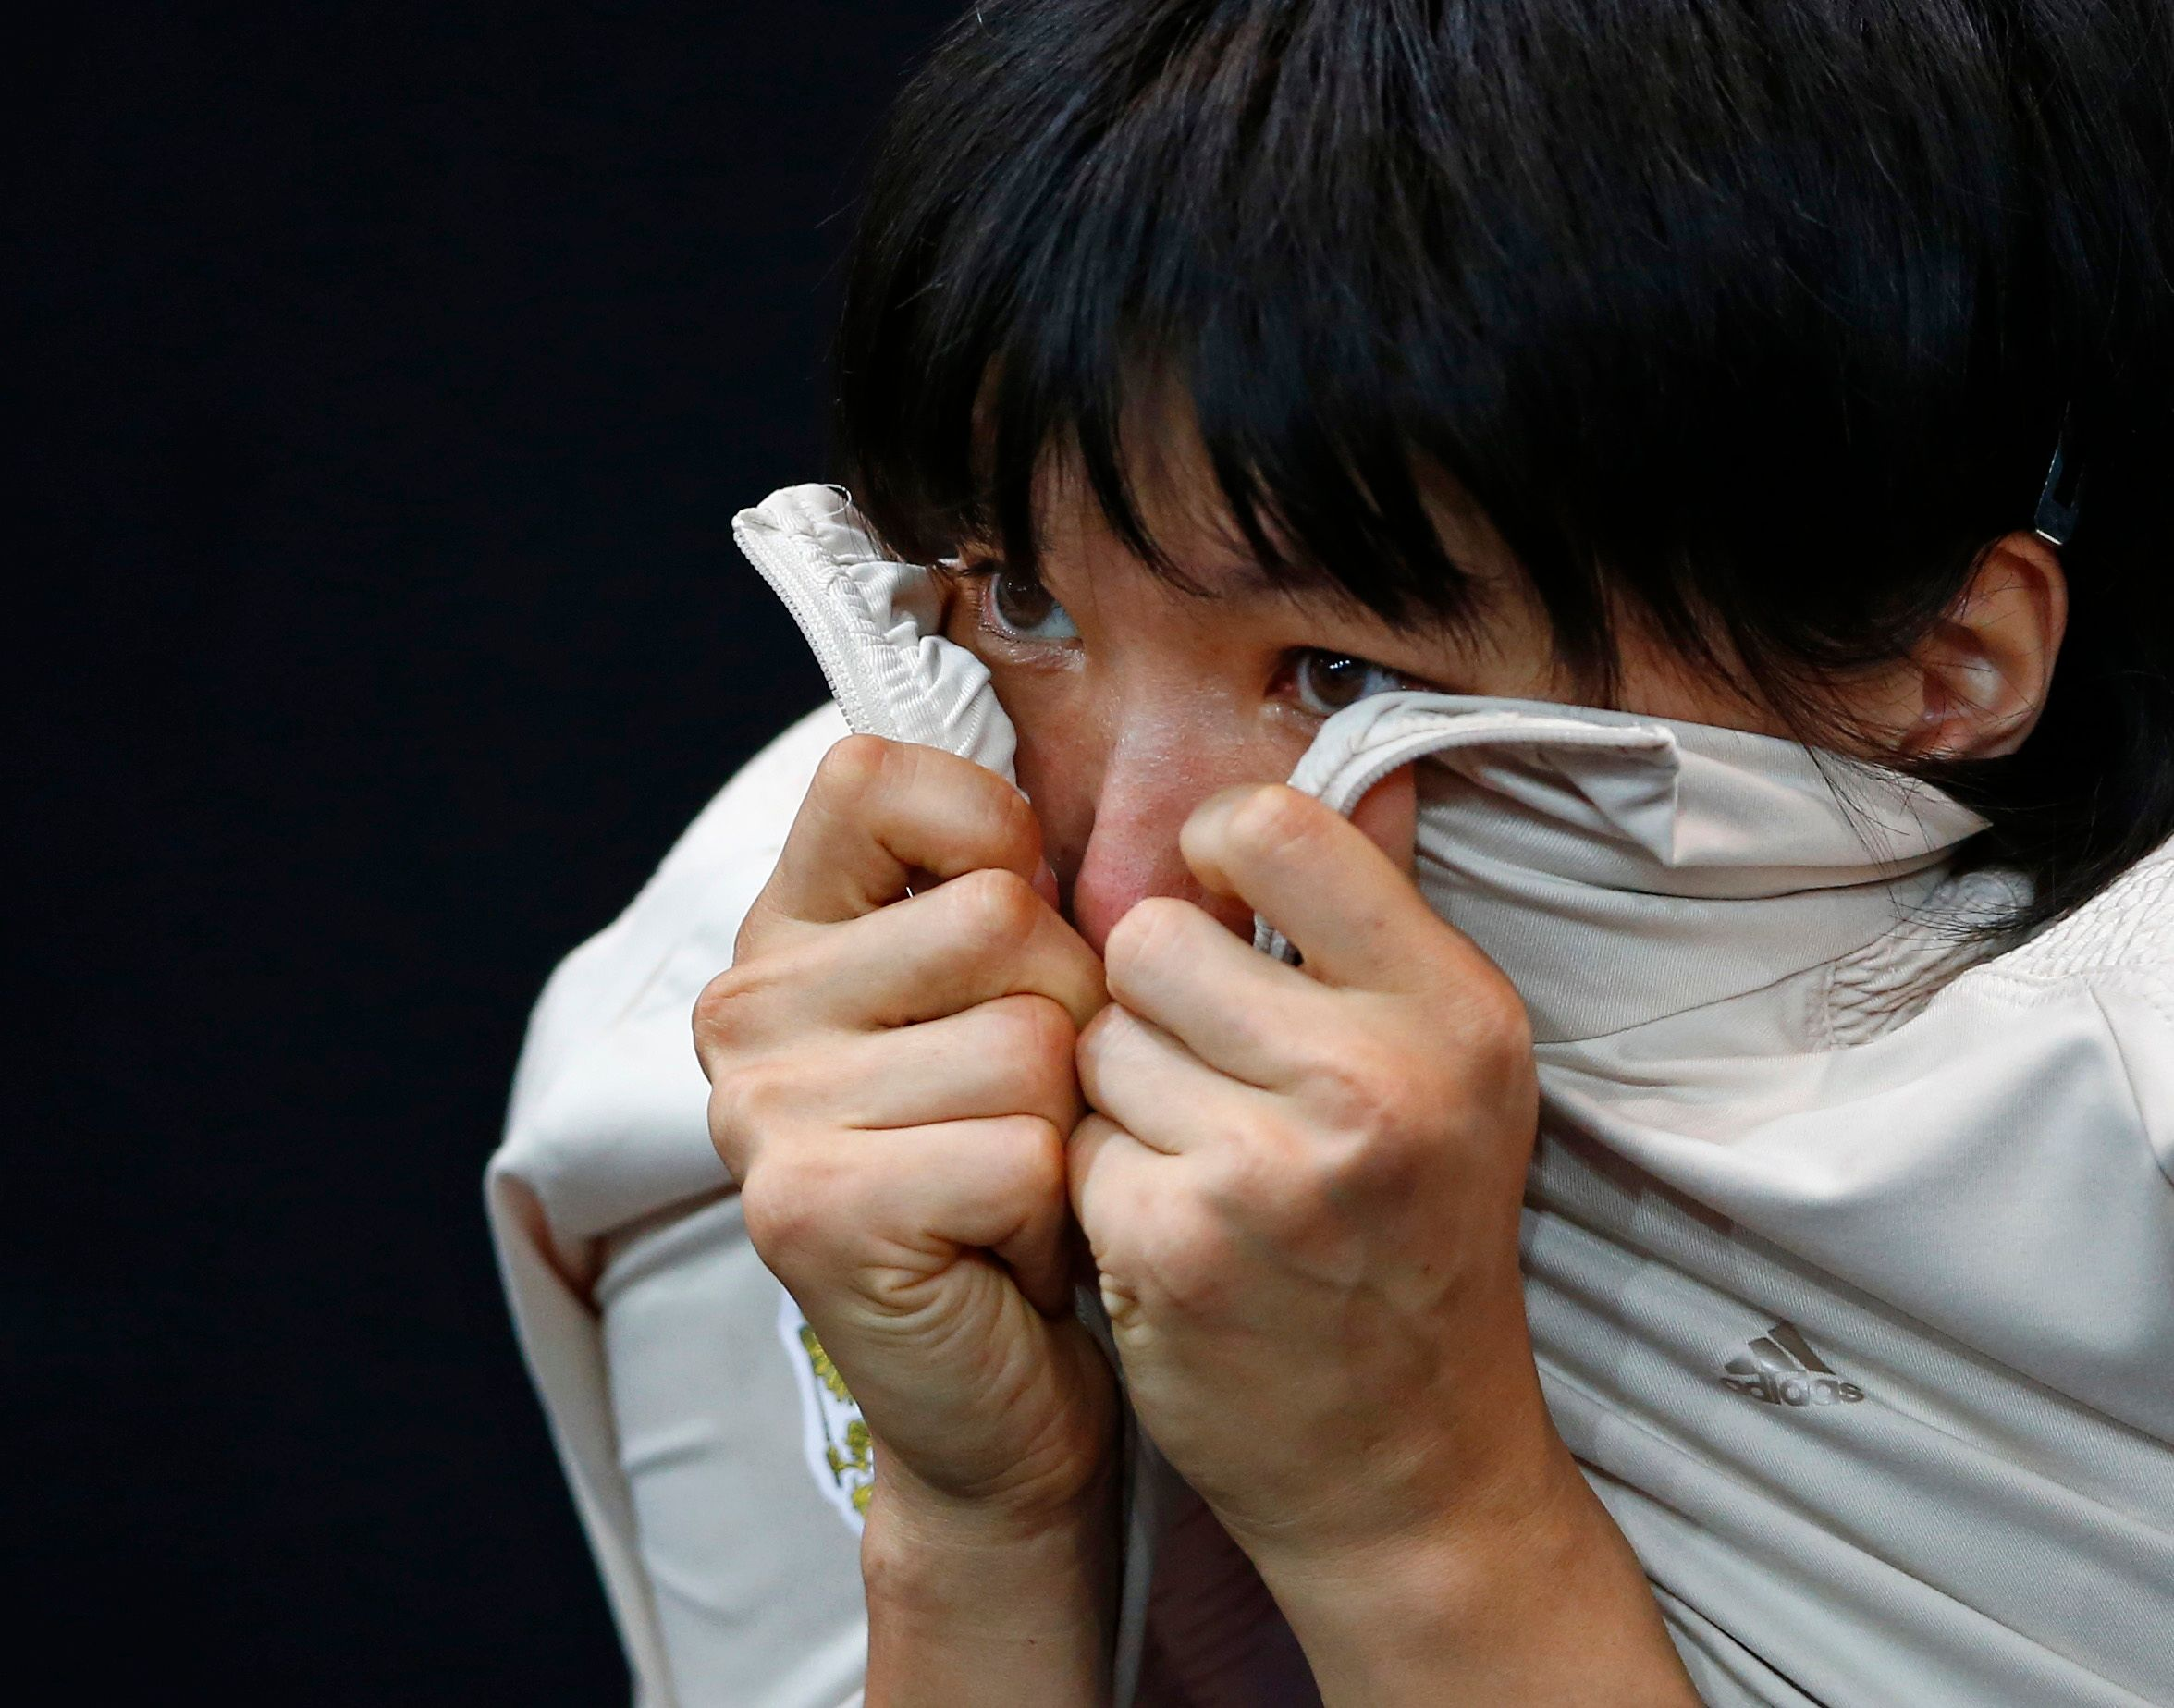 Le Coronavirus, virus fatal pour le progressisme ?